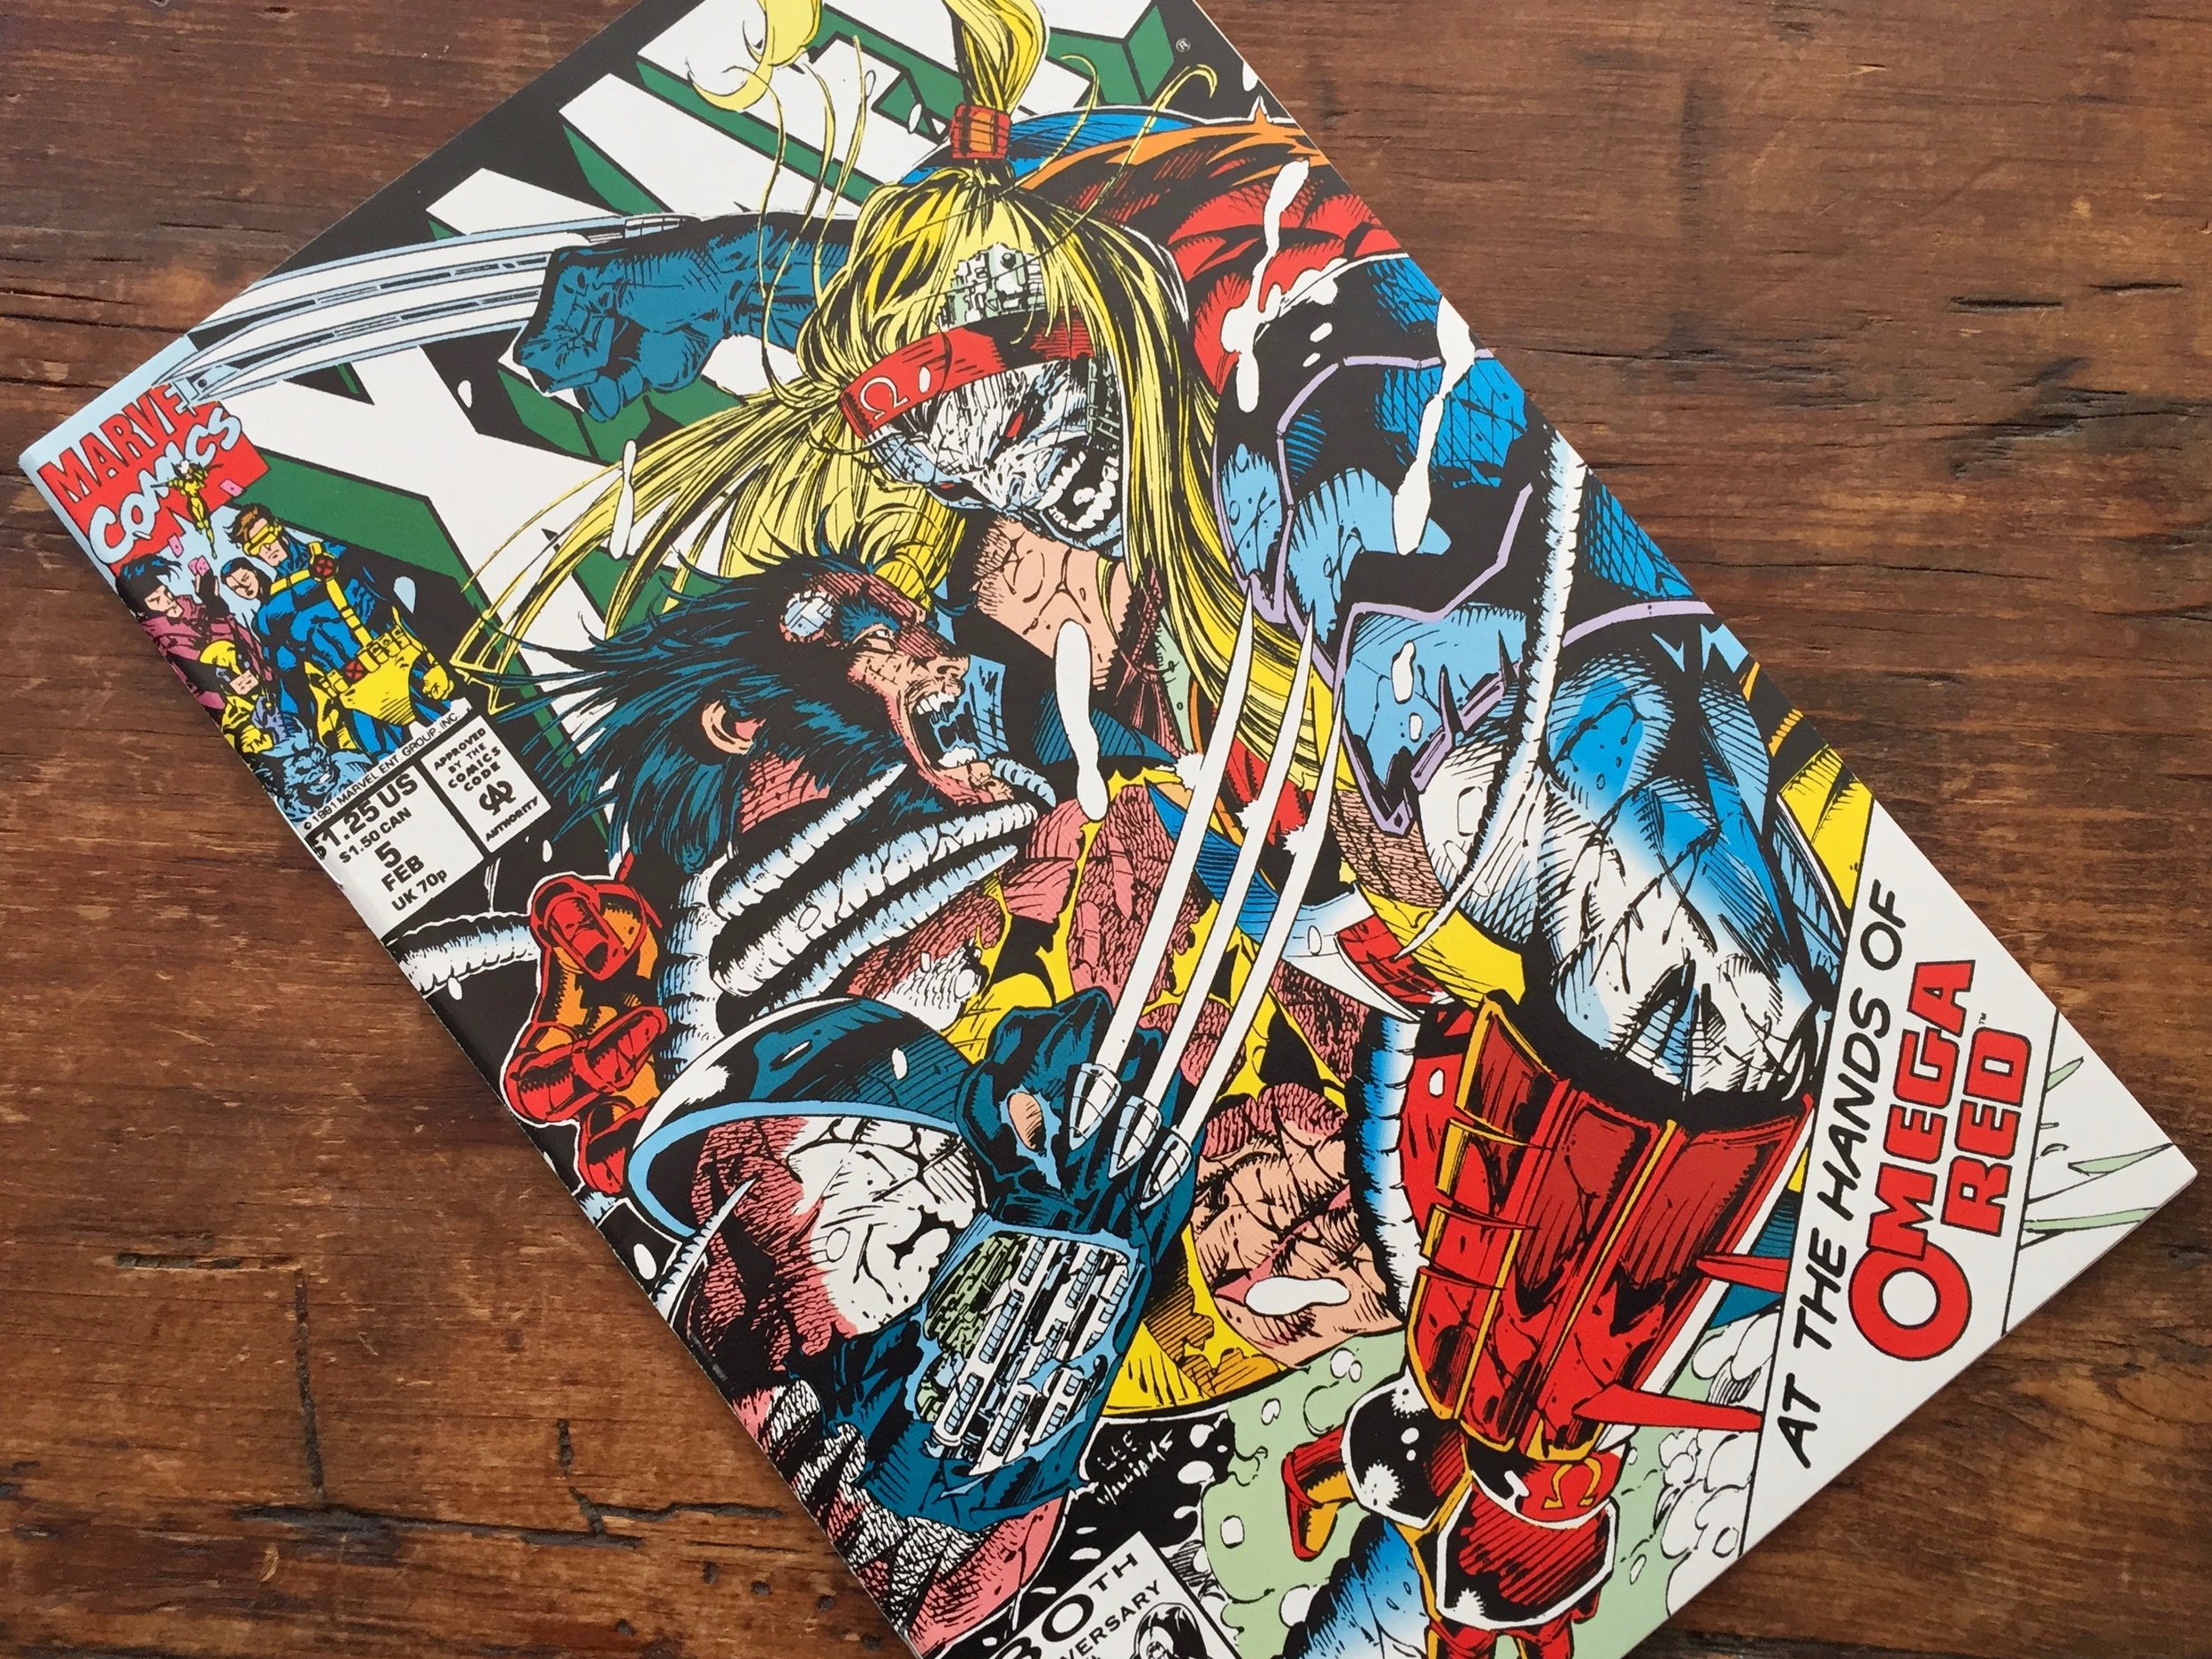 X-Men #5 1992